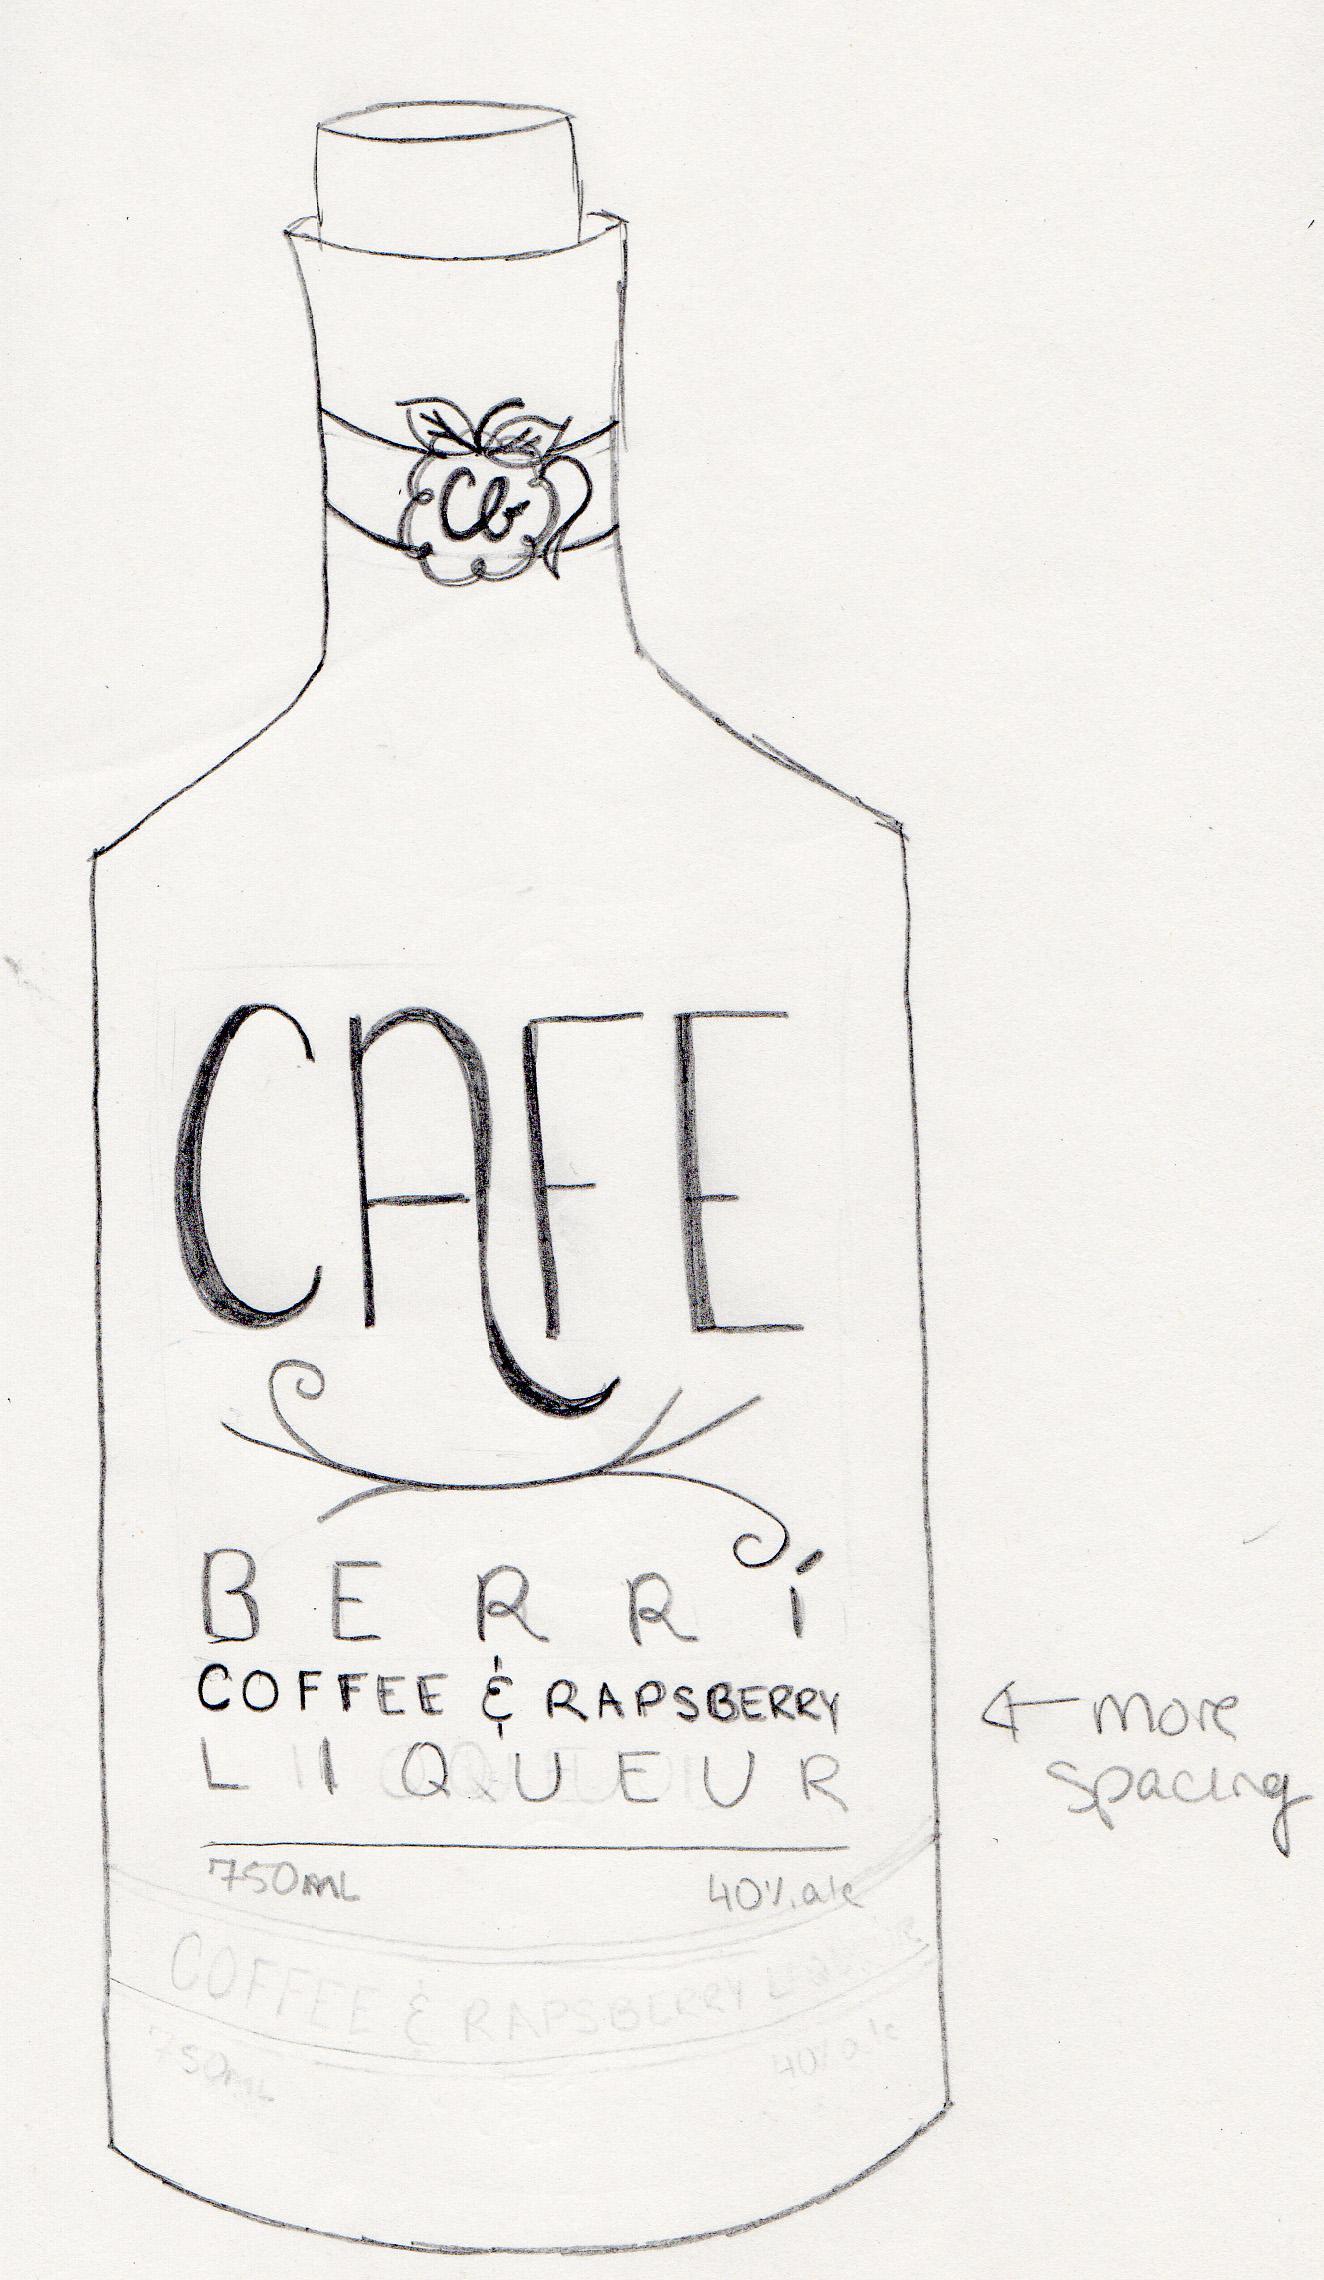 Cafe Berrí - image 6 - student project